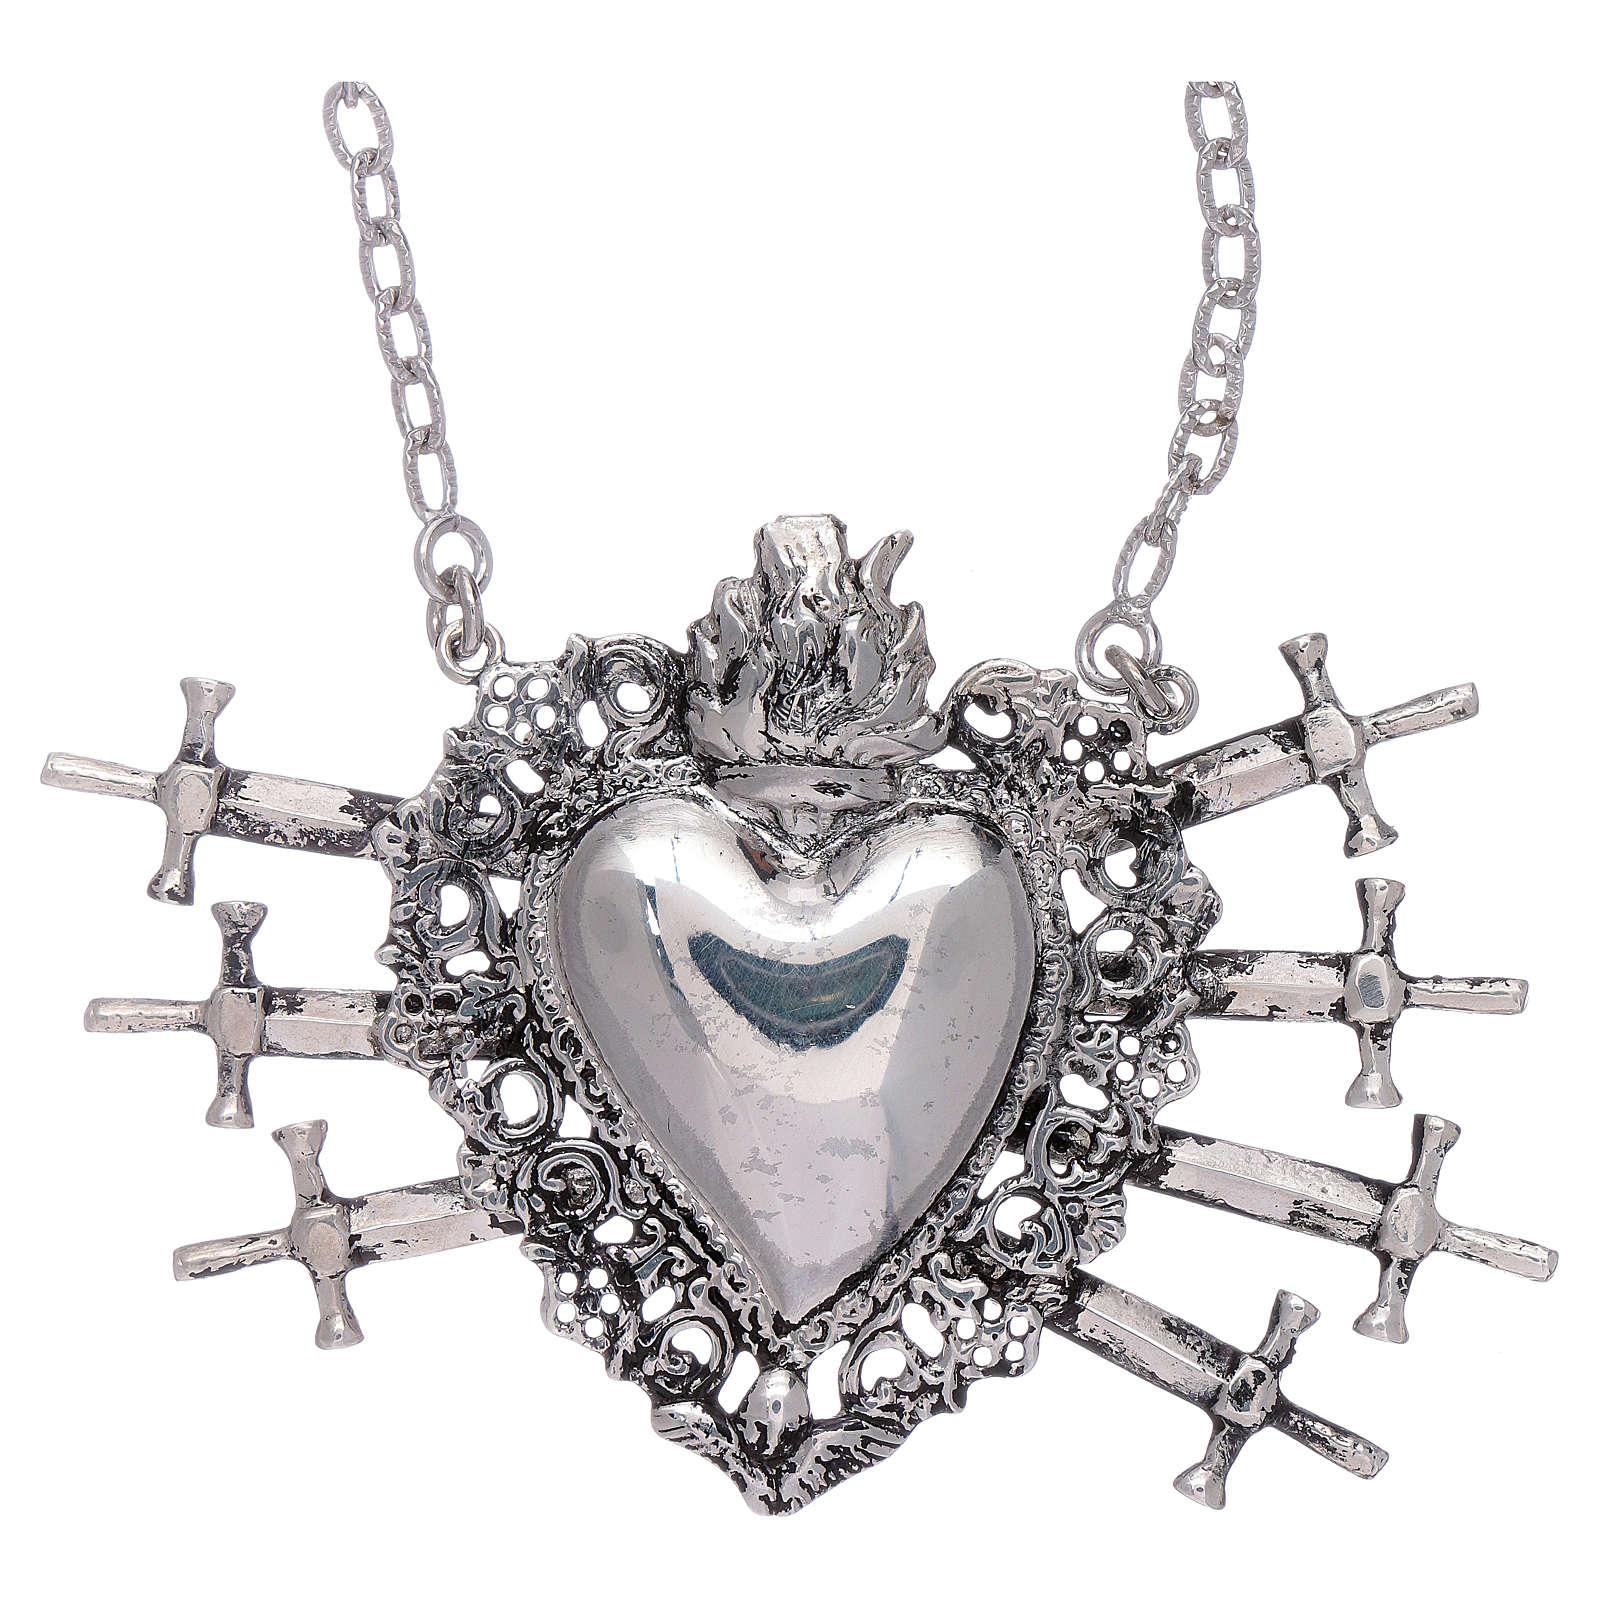 Girocollo con cuore votivo e sette spade argento 925 4